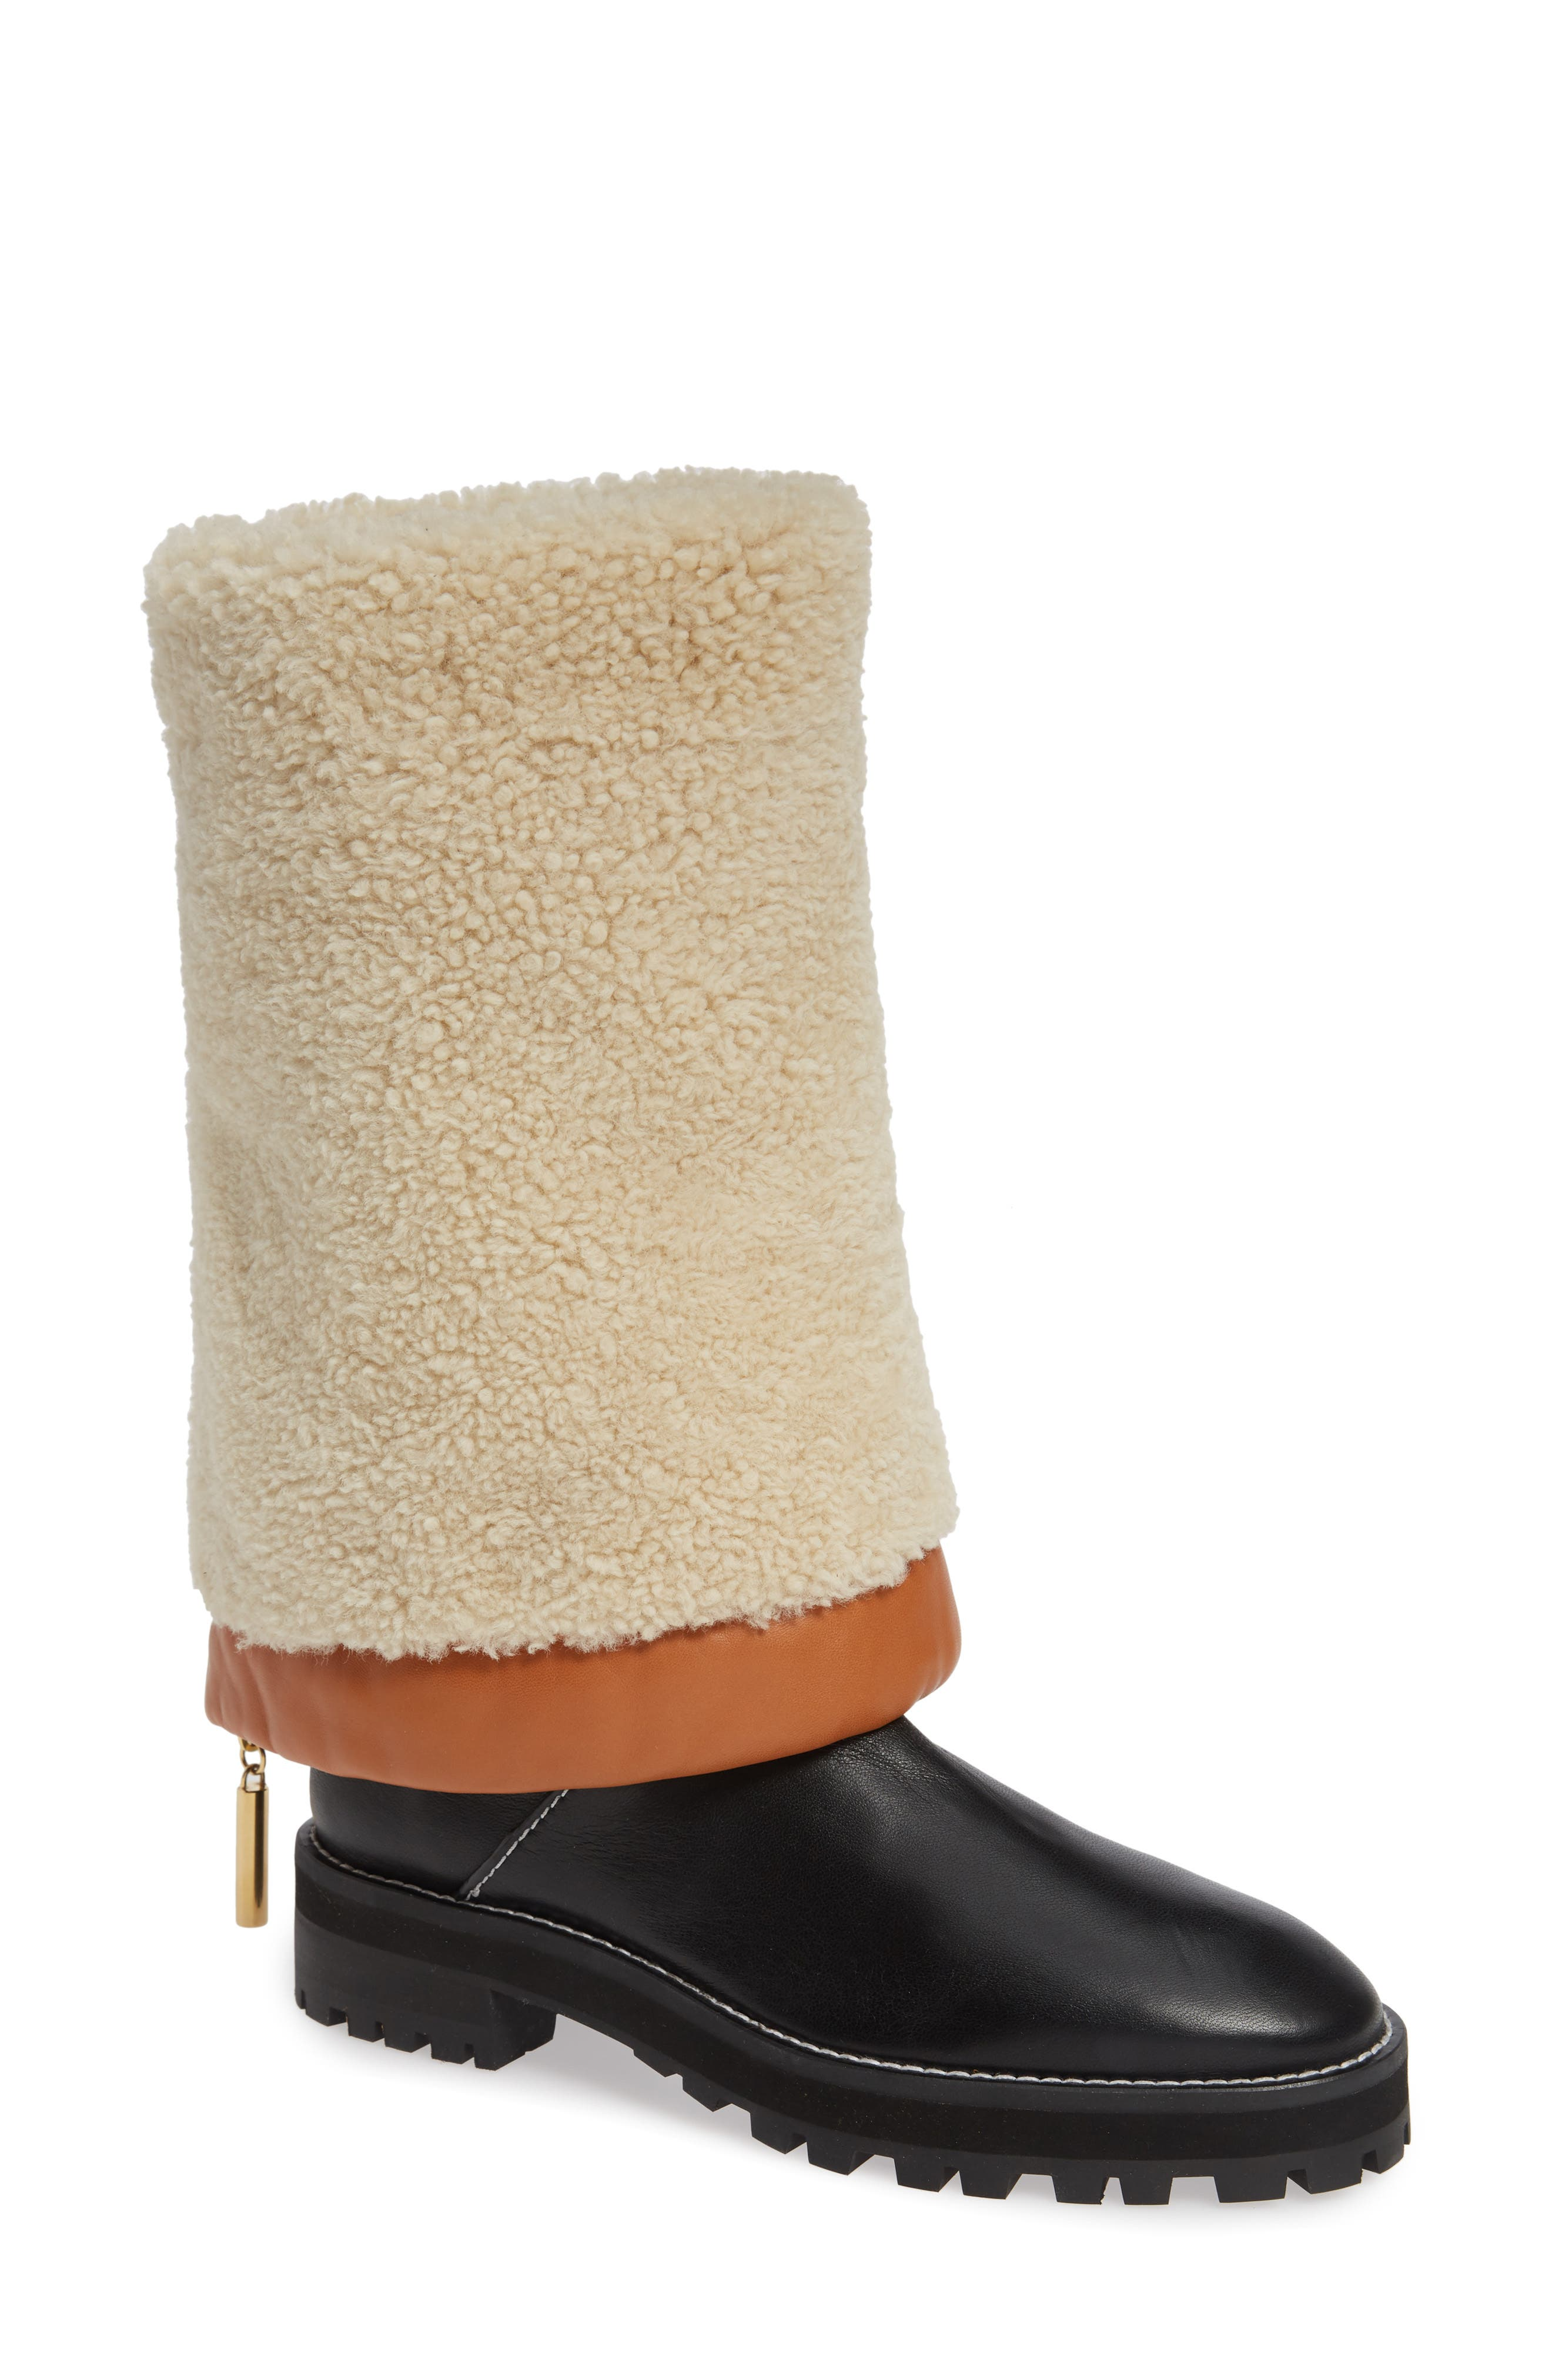 Stuart Weitzman Renata Genuine Shearling Boot